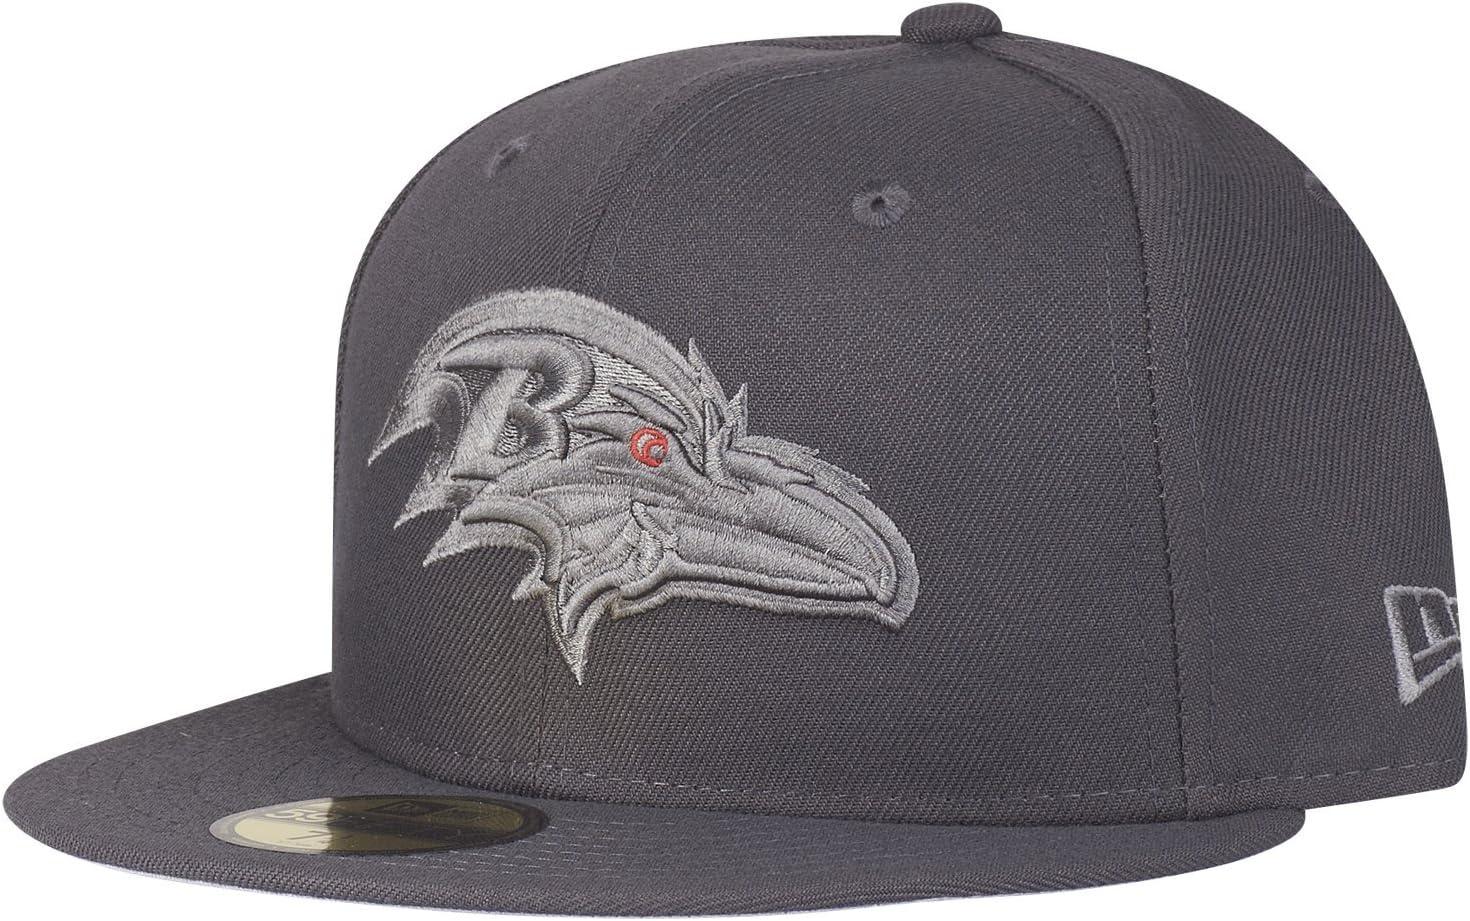 New Era 59Fifty Cap Graphite Baltimore Ravens